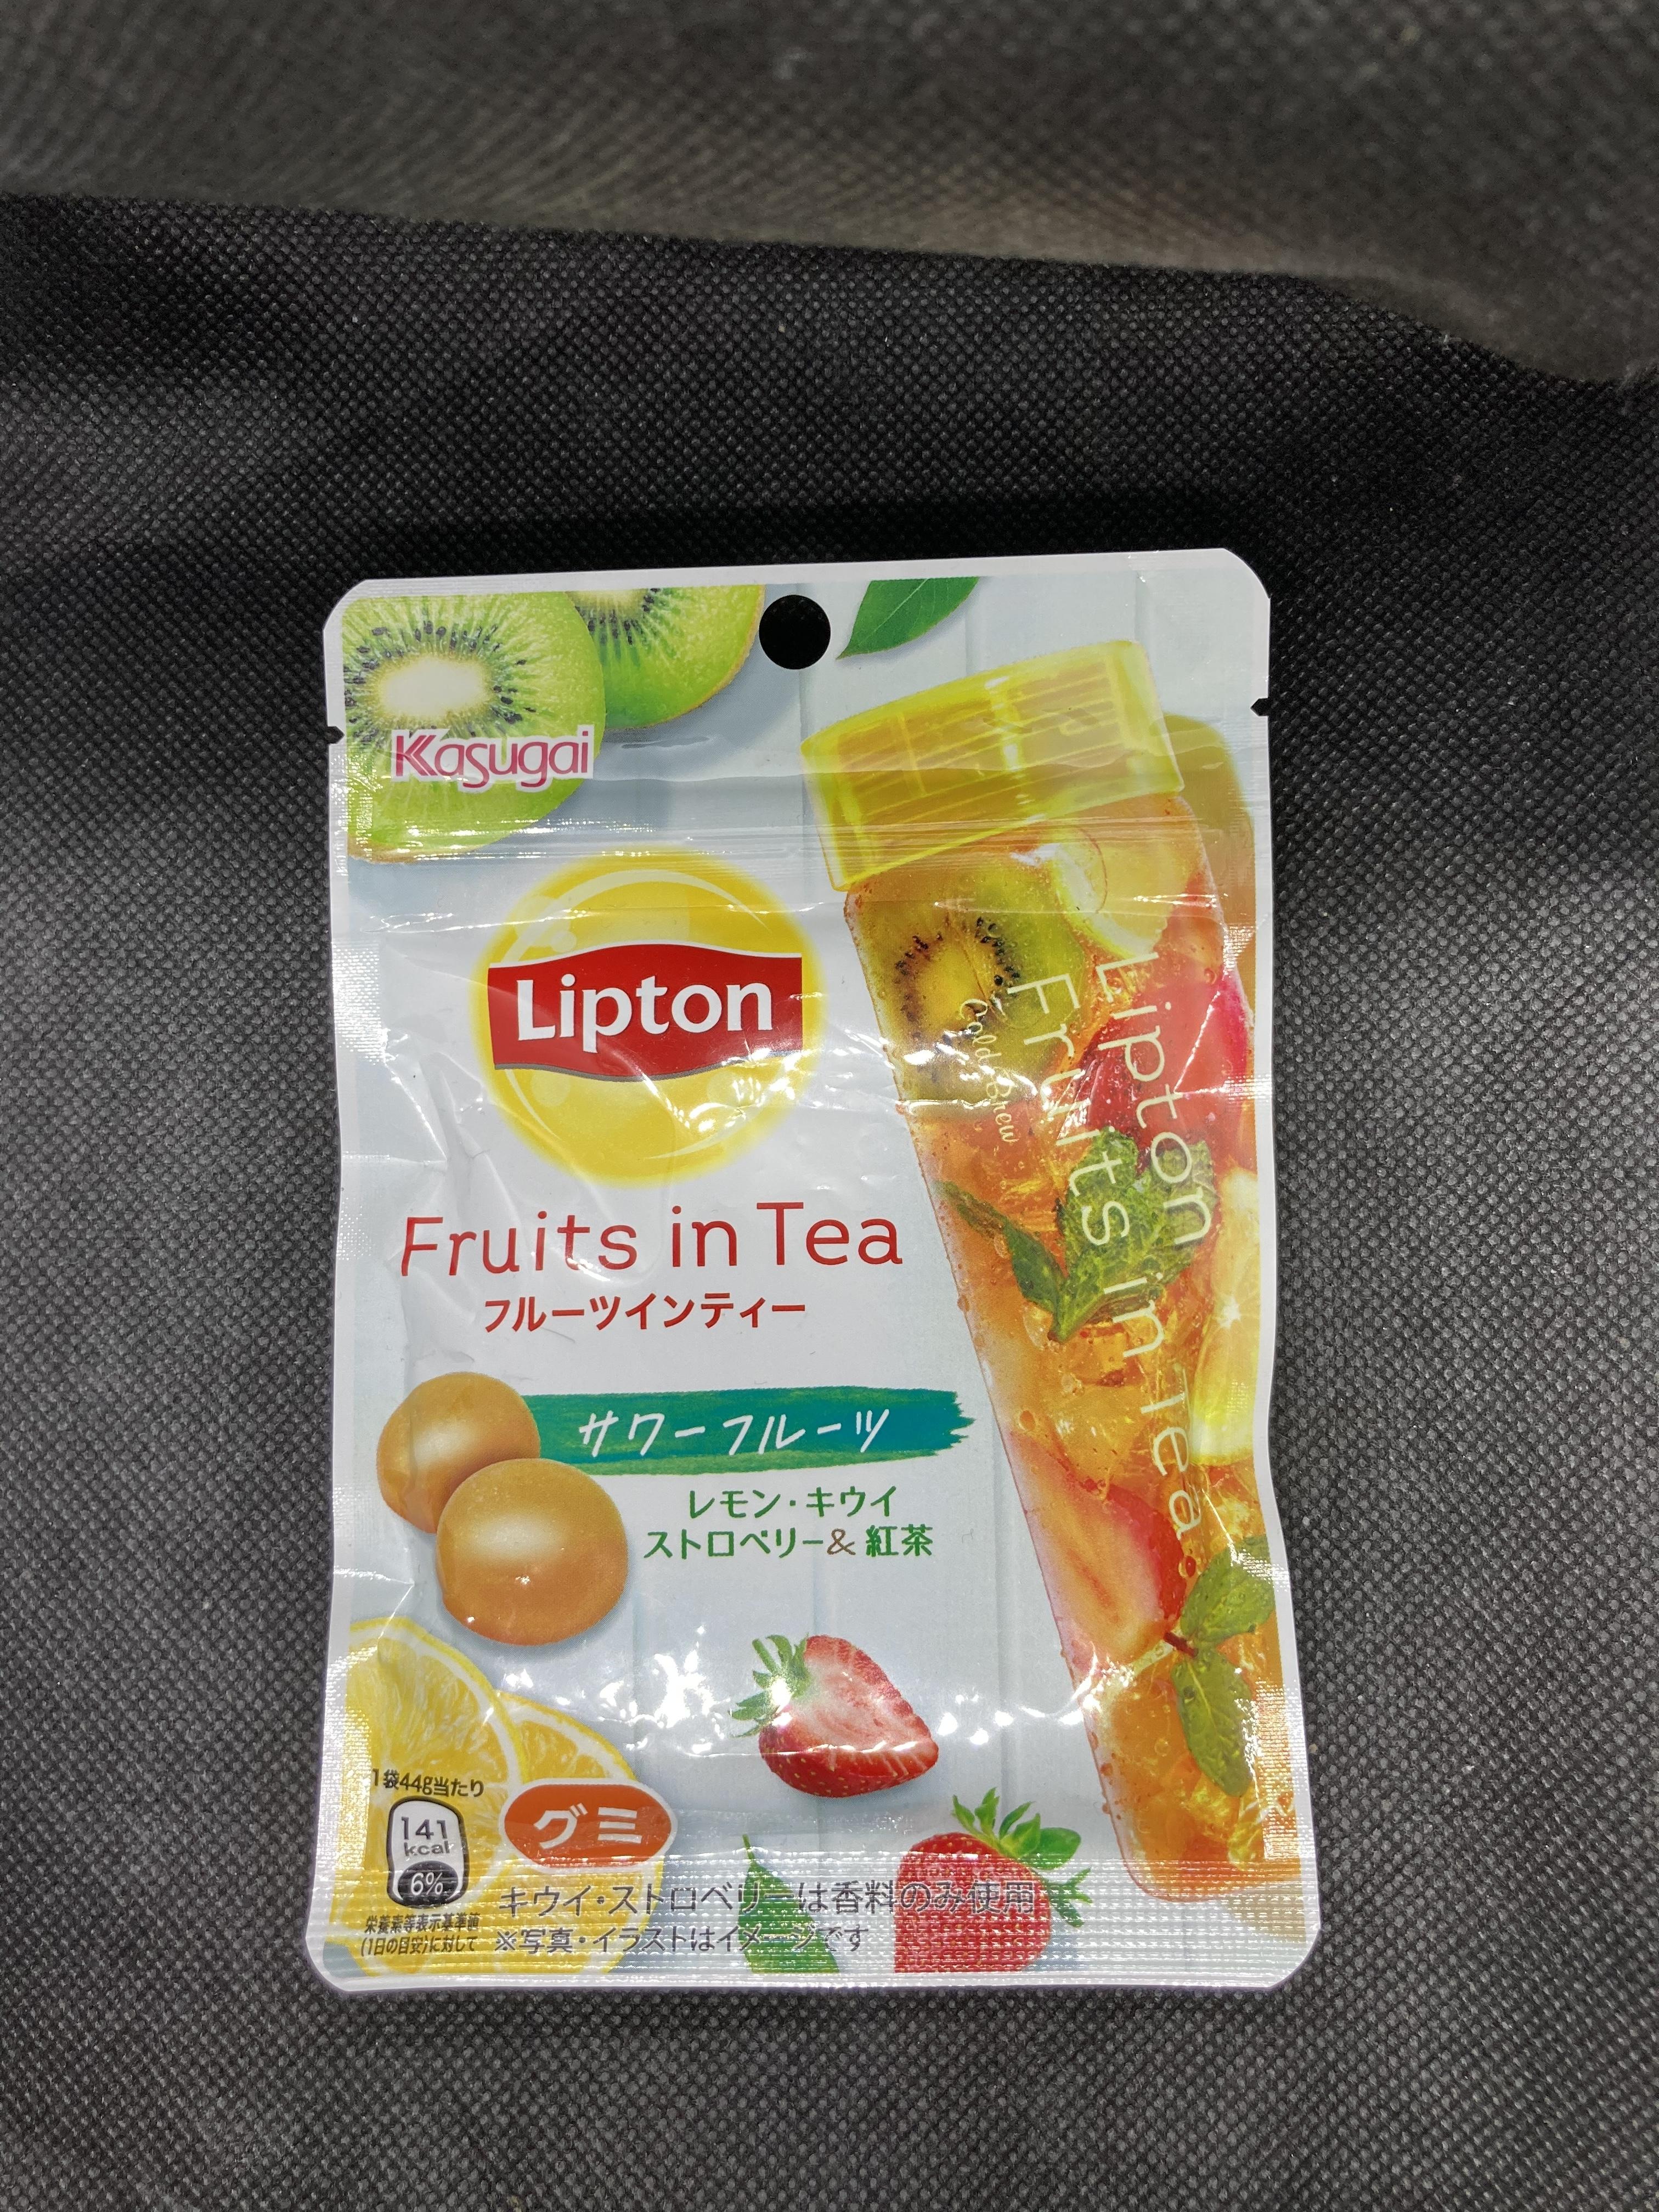 Lipton(リプトン) フルーツインティーグミ  サワーフルーツ